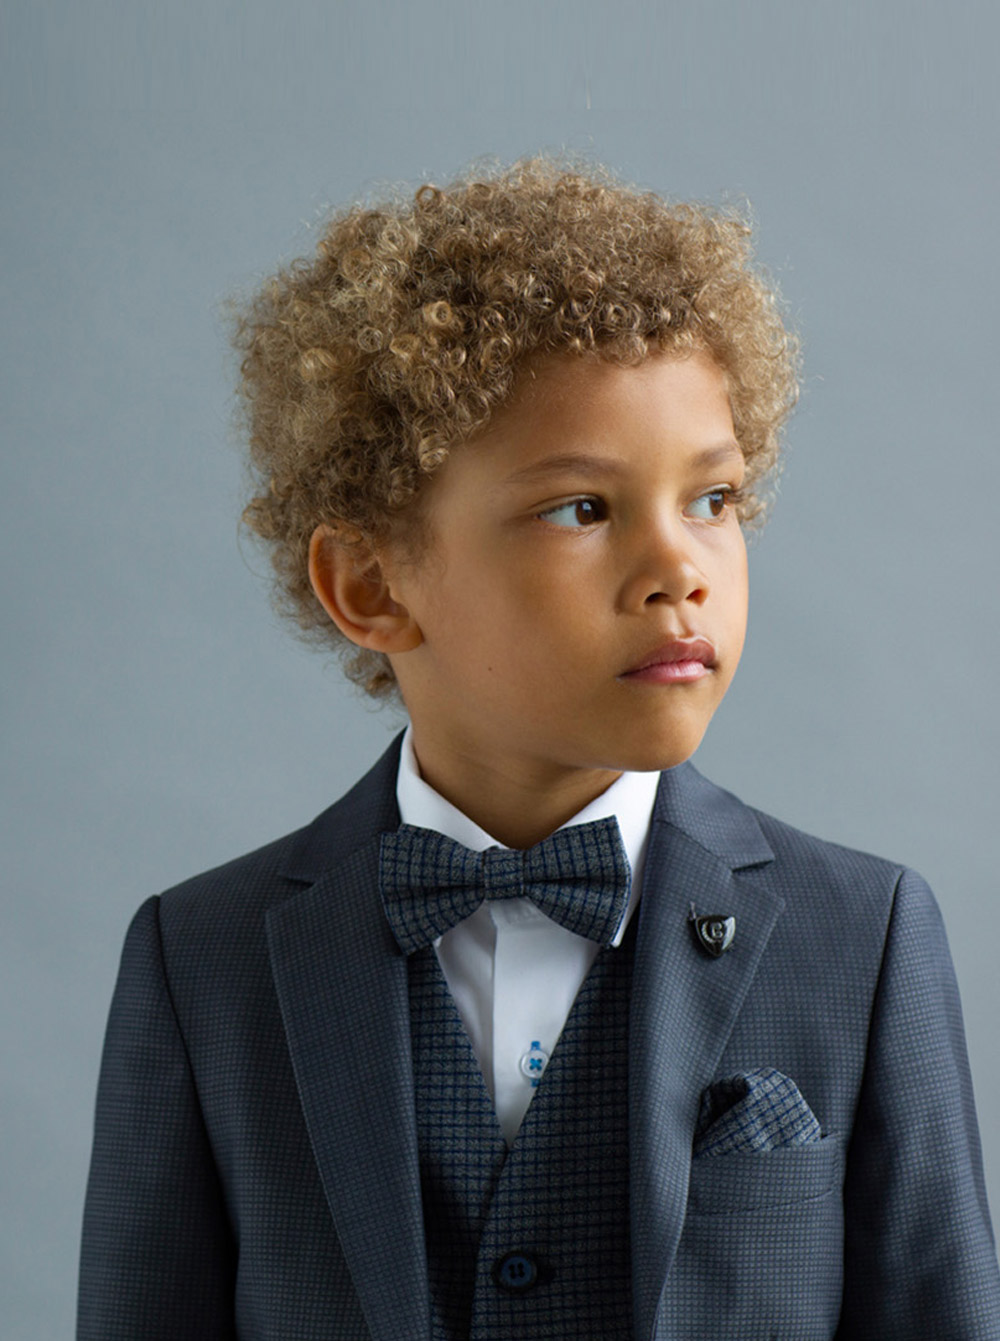 James Grey Tweed Boys 3 Piece Suit